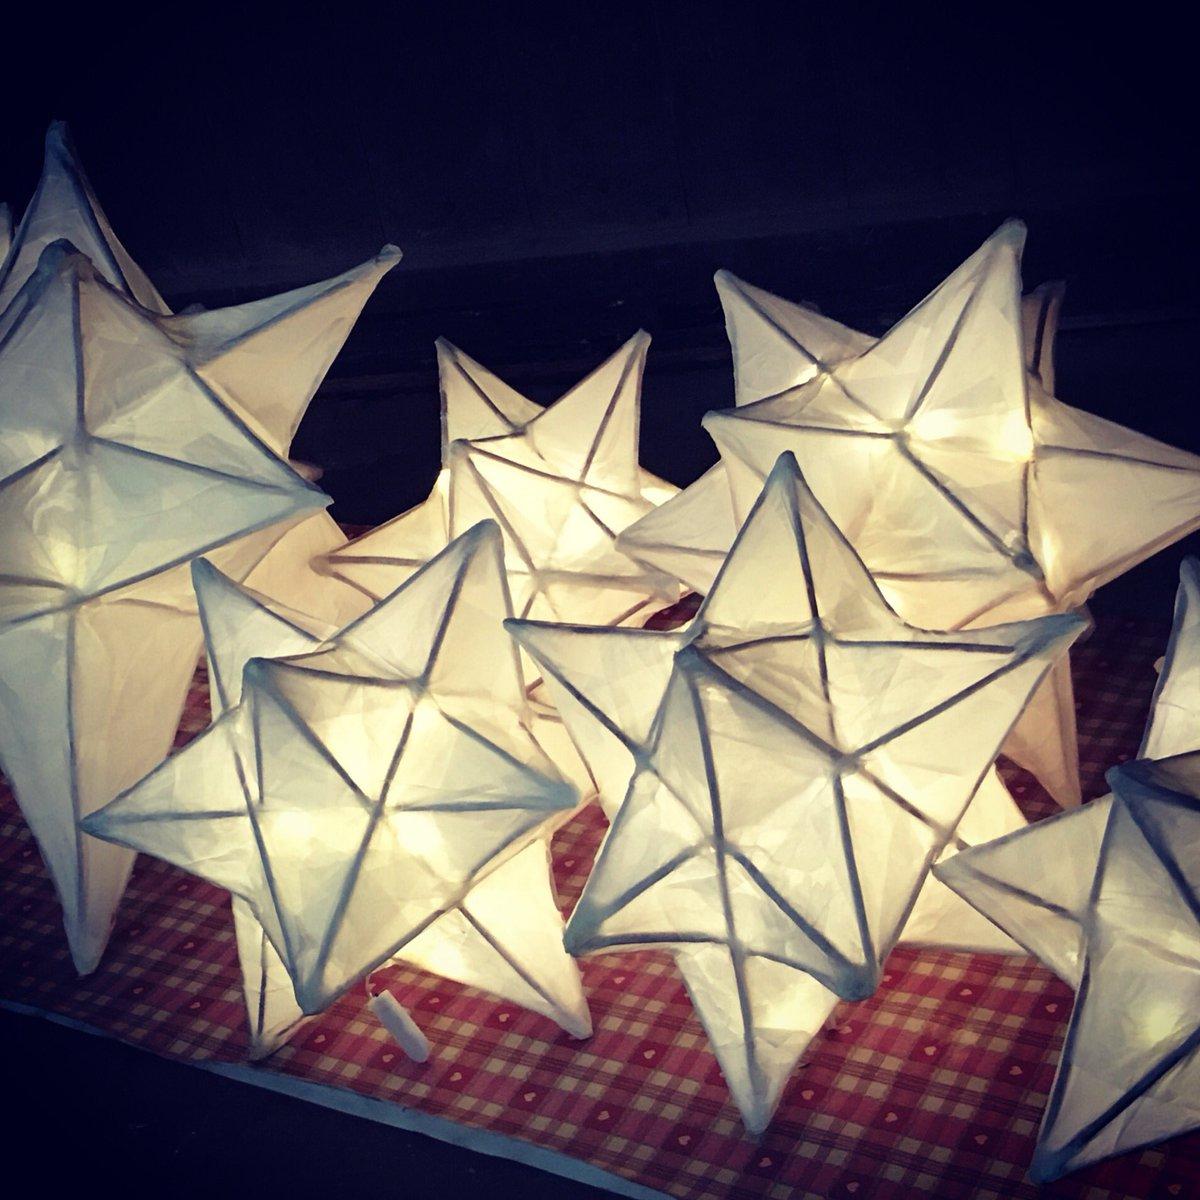 http://gedmurray.com/wp-content/gallery/lantern-parade/cnv00030a ... | 1200x1200